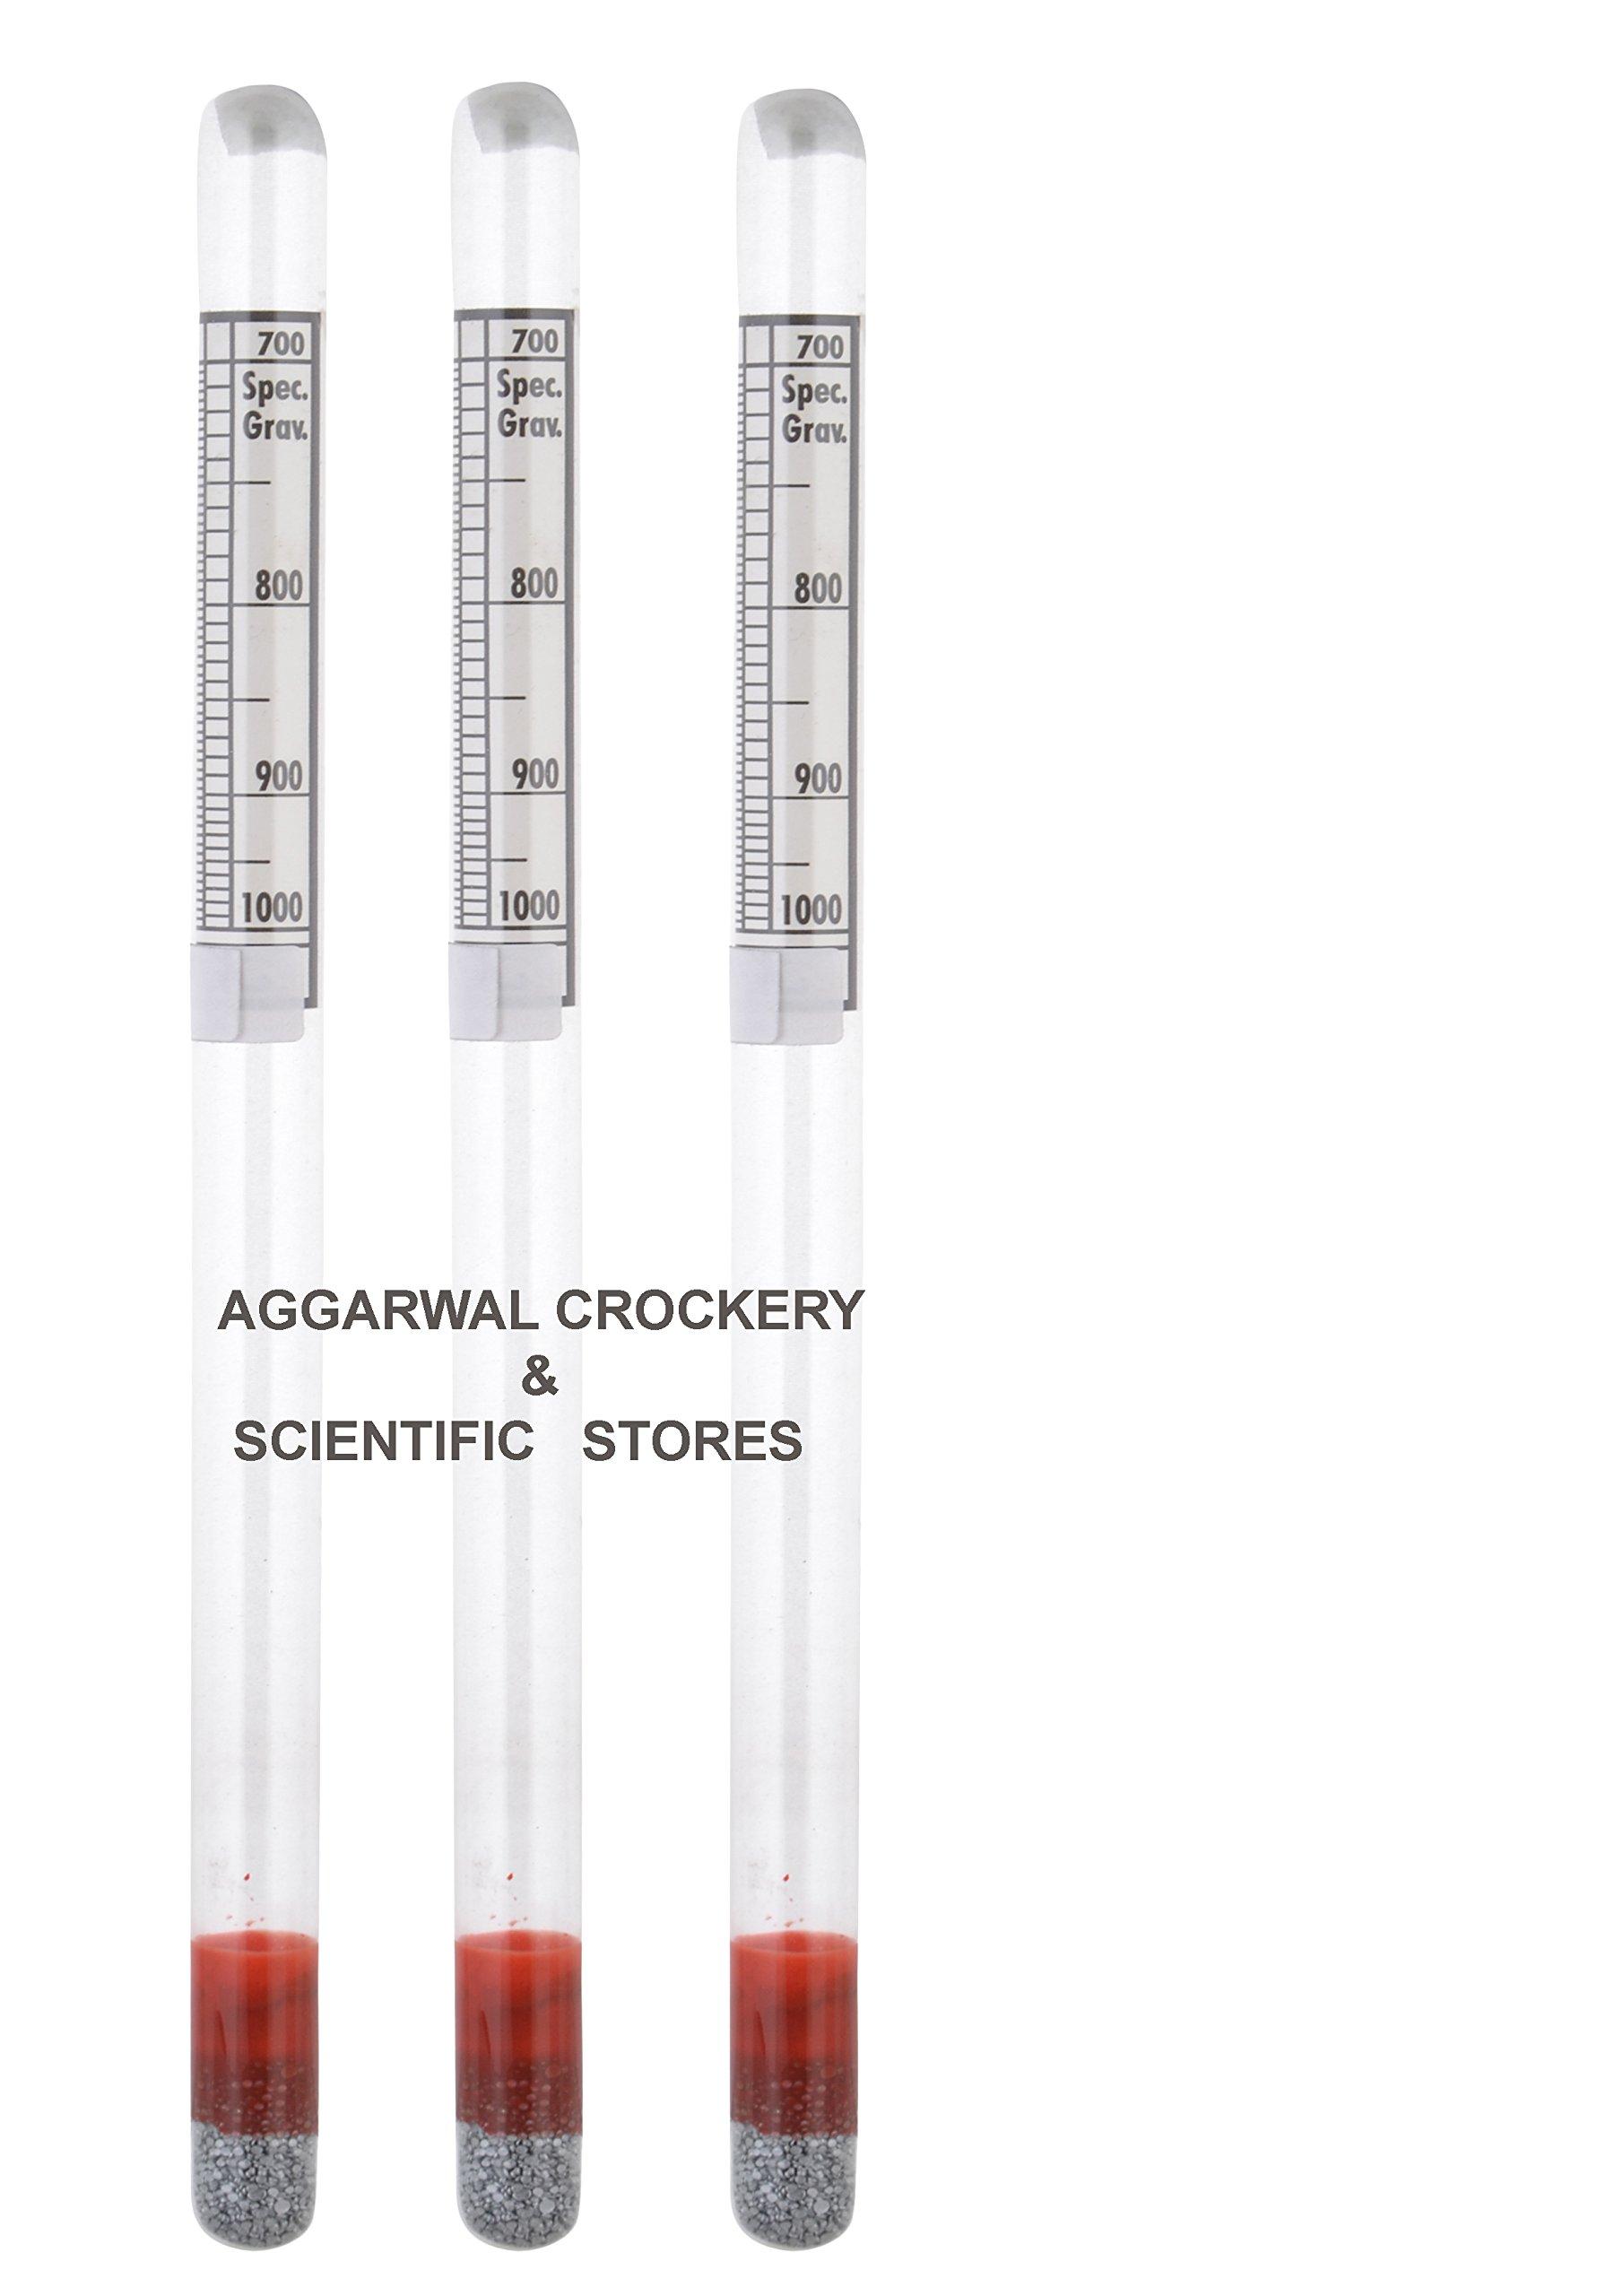 Aggarwal Crockery & Scientific Stores Hydrometer 700-1000 (Light liquid) Pack of 3